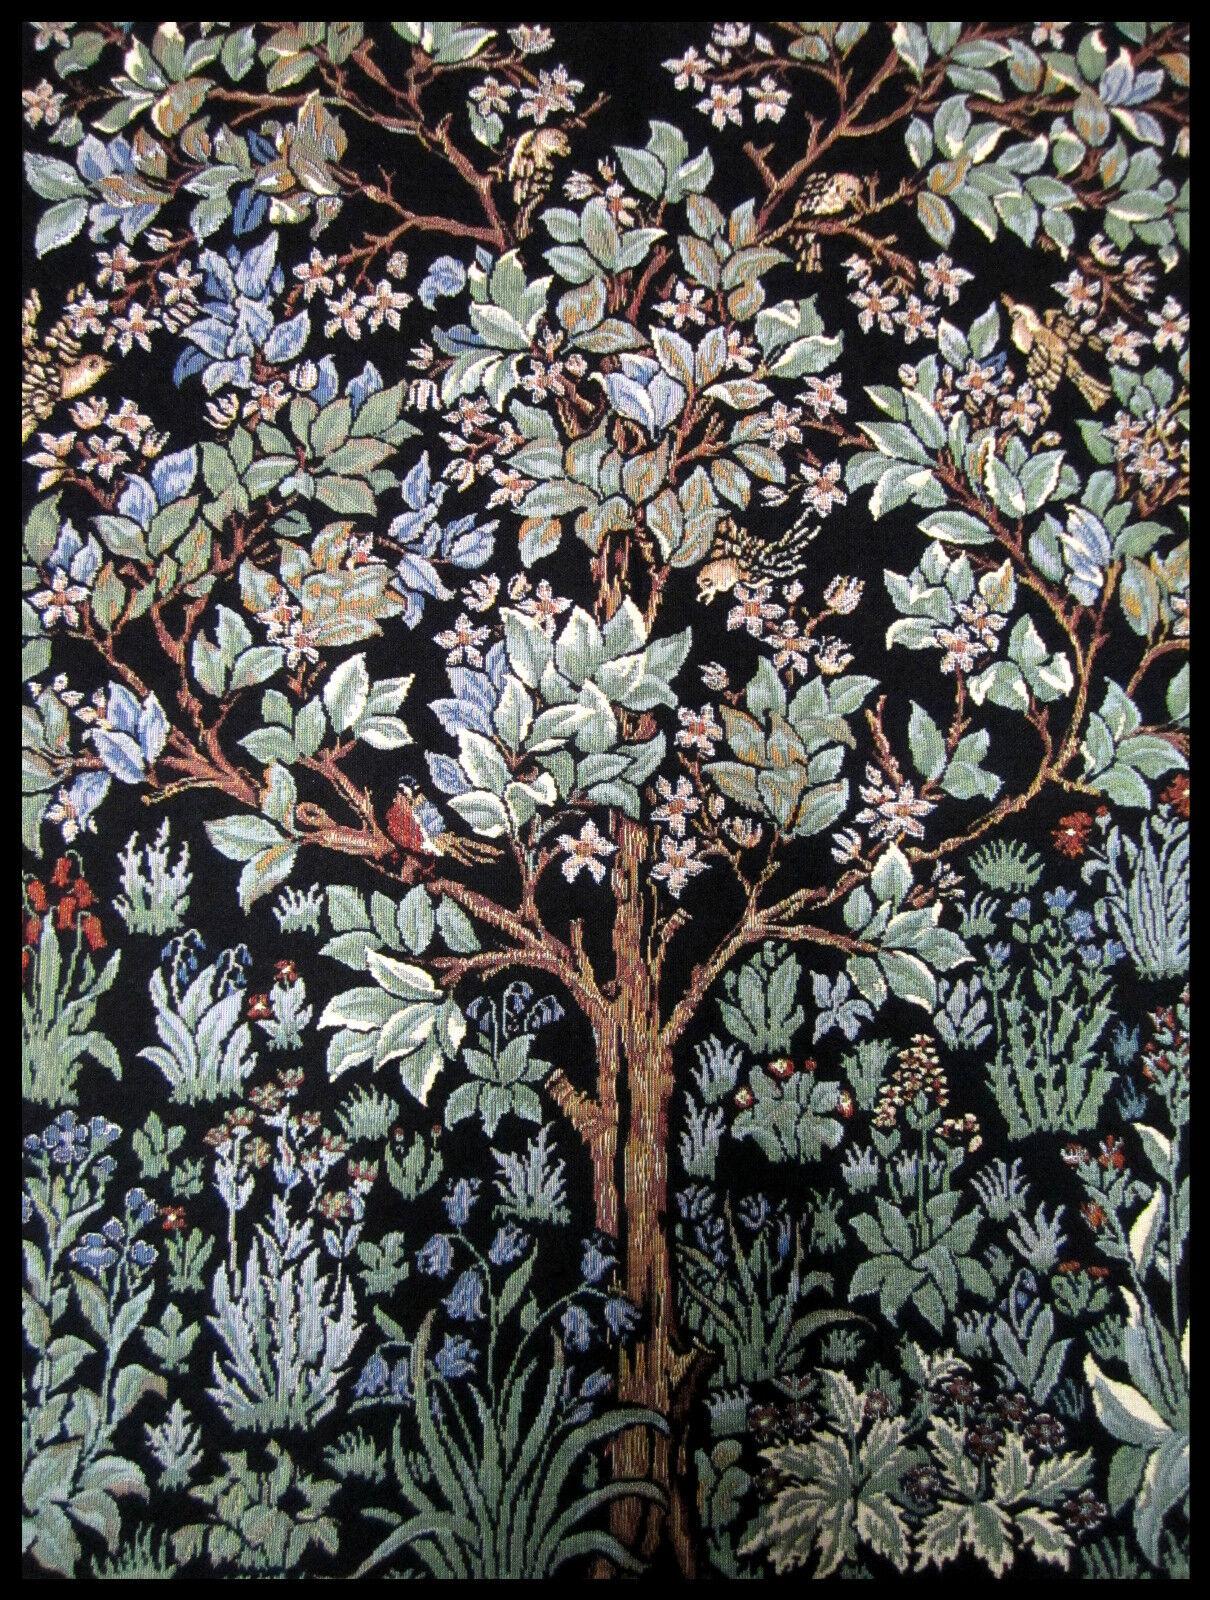 Wandteppich aus Italy Gobelin William Morris Lebensbaum Tree of Life 70x90 cm  eBay